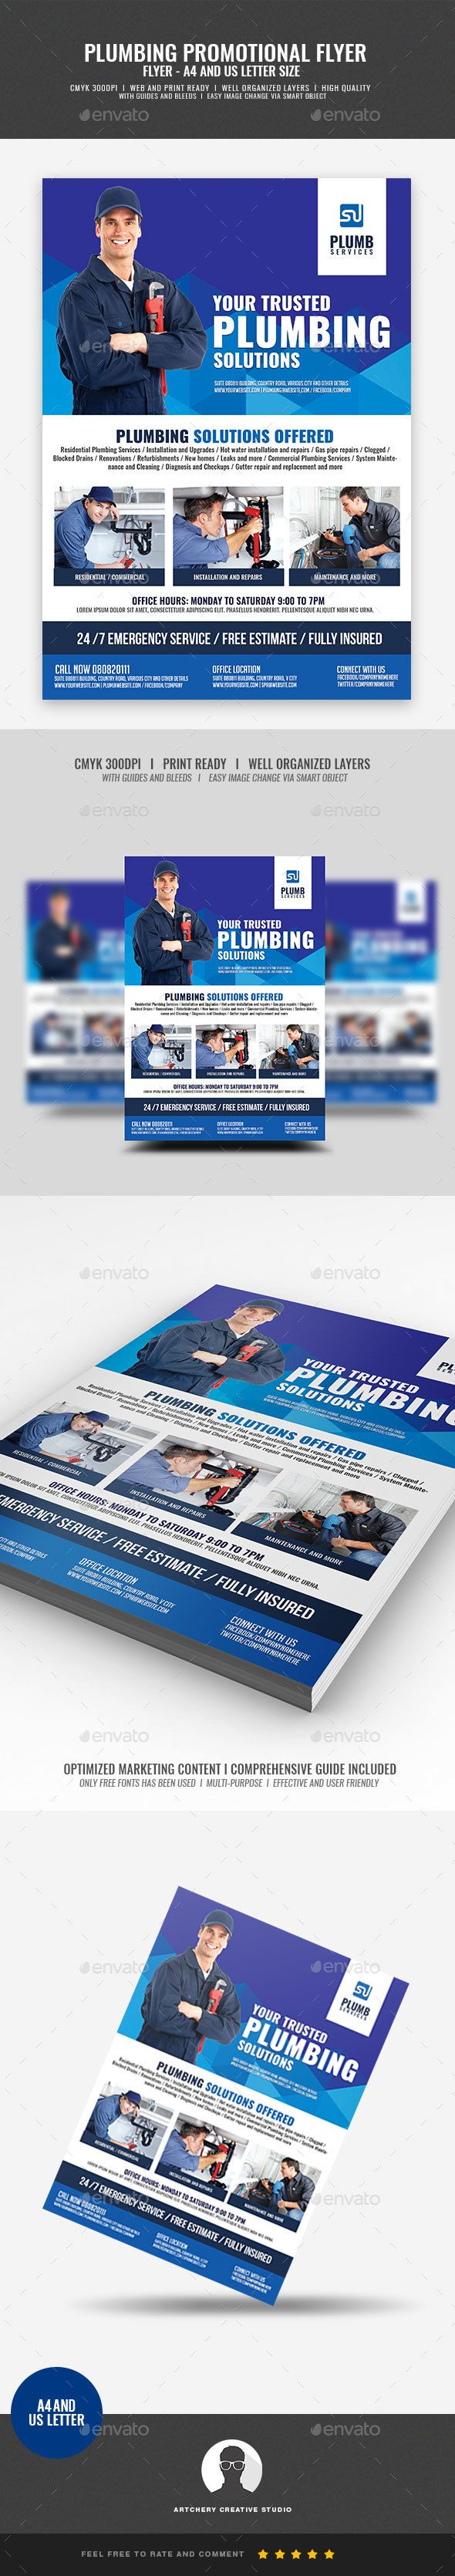 Plumbing #Company Promotional #Flyer - Commerce Flyers